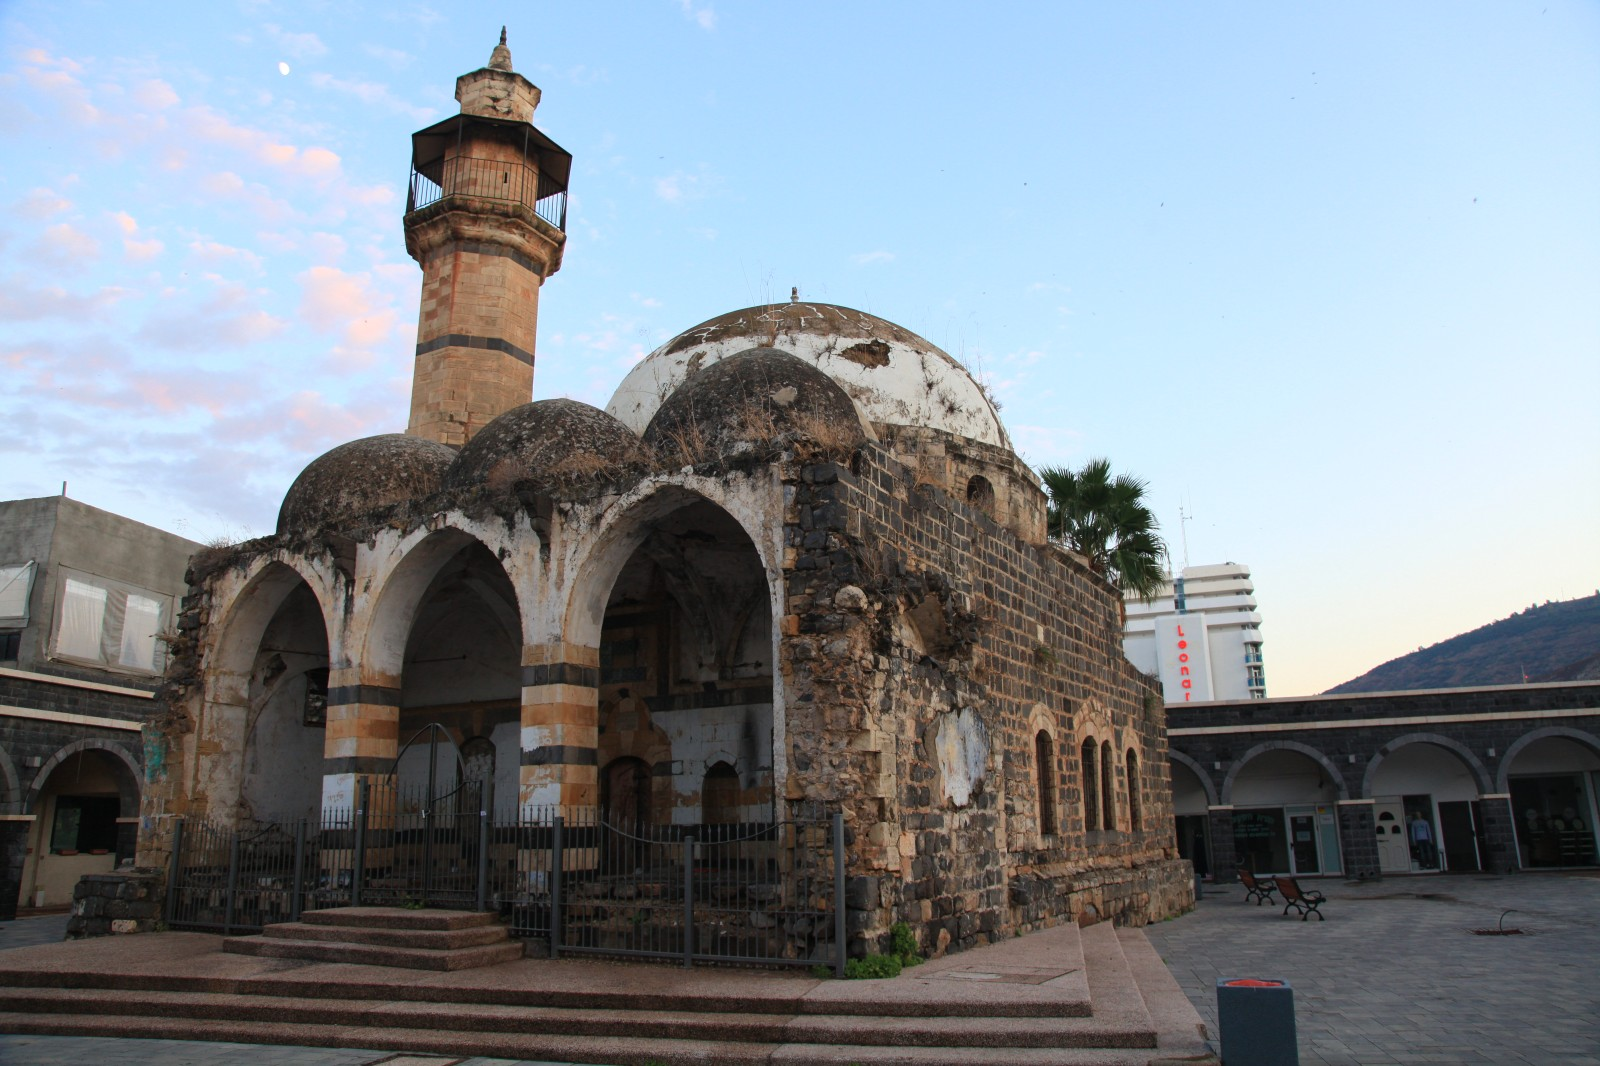 Abandoned mosque in Tiberias